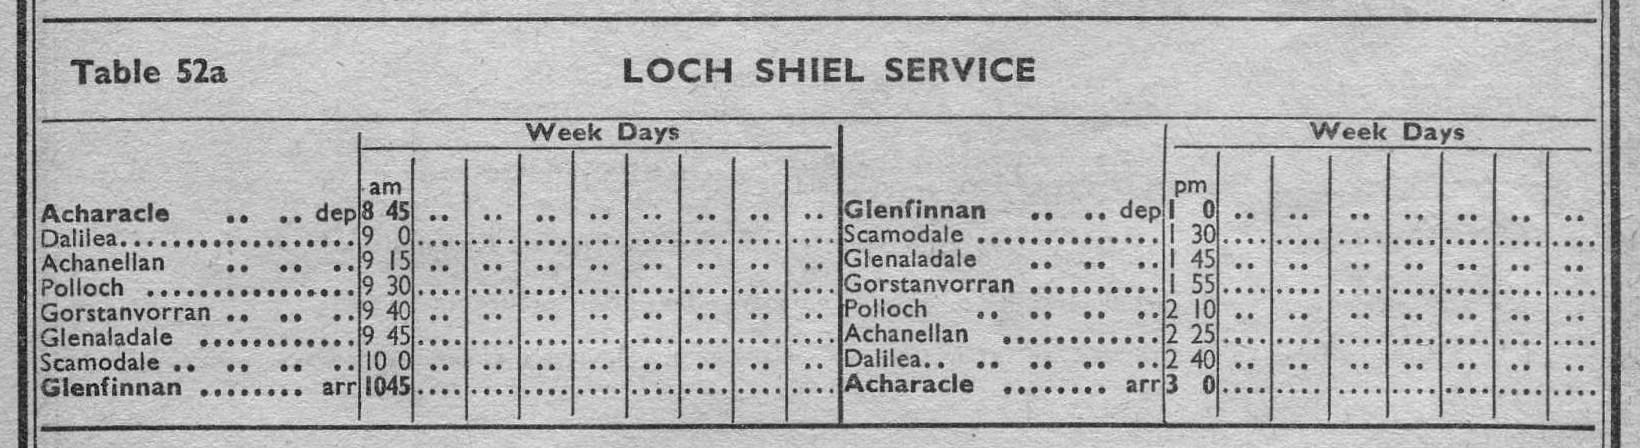 1959 Timetable